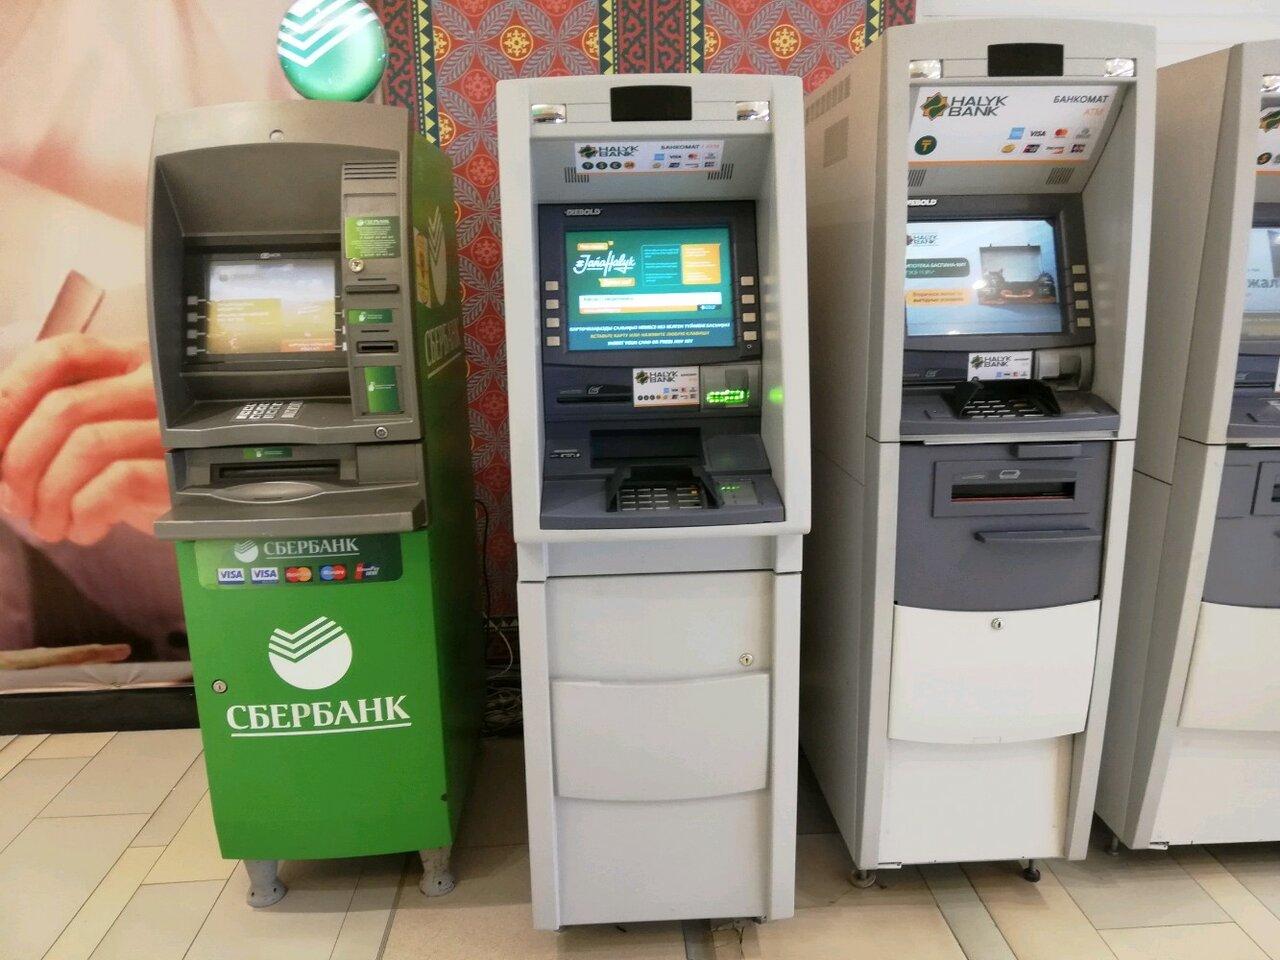 Срок хранения фото с банкоматов рк колбаса